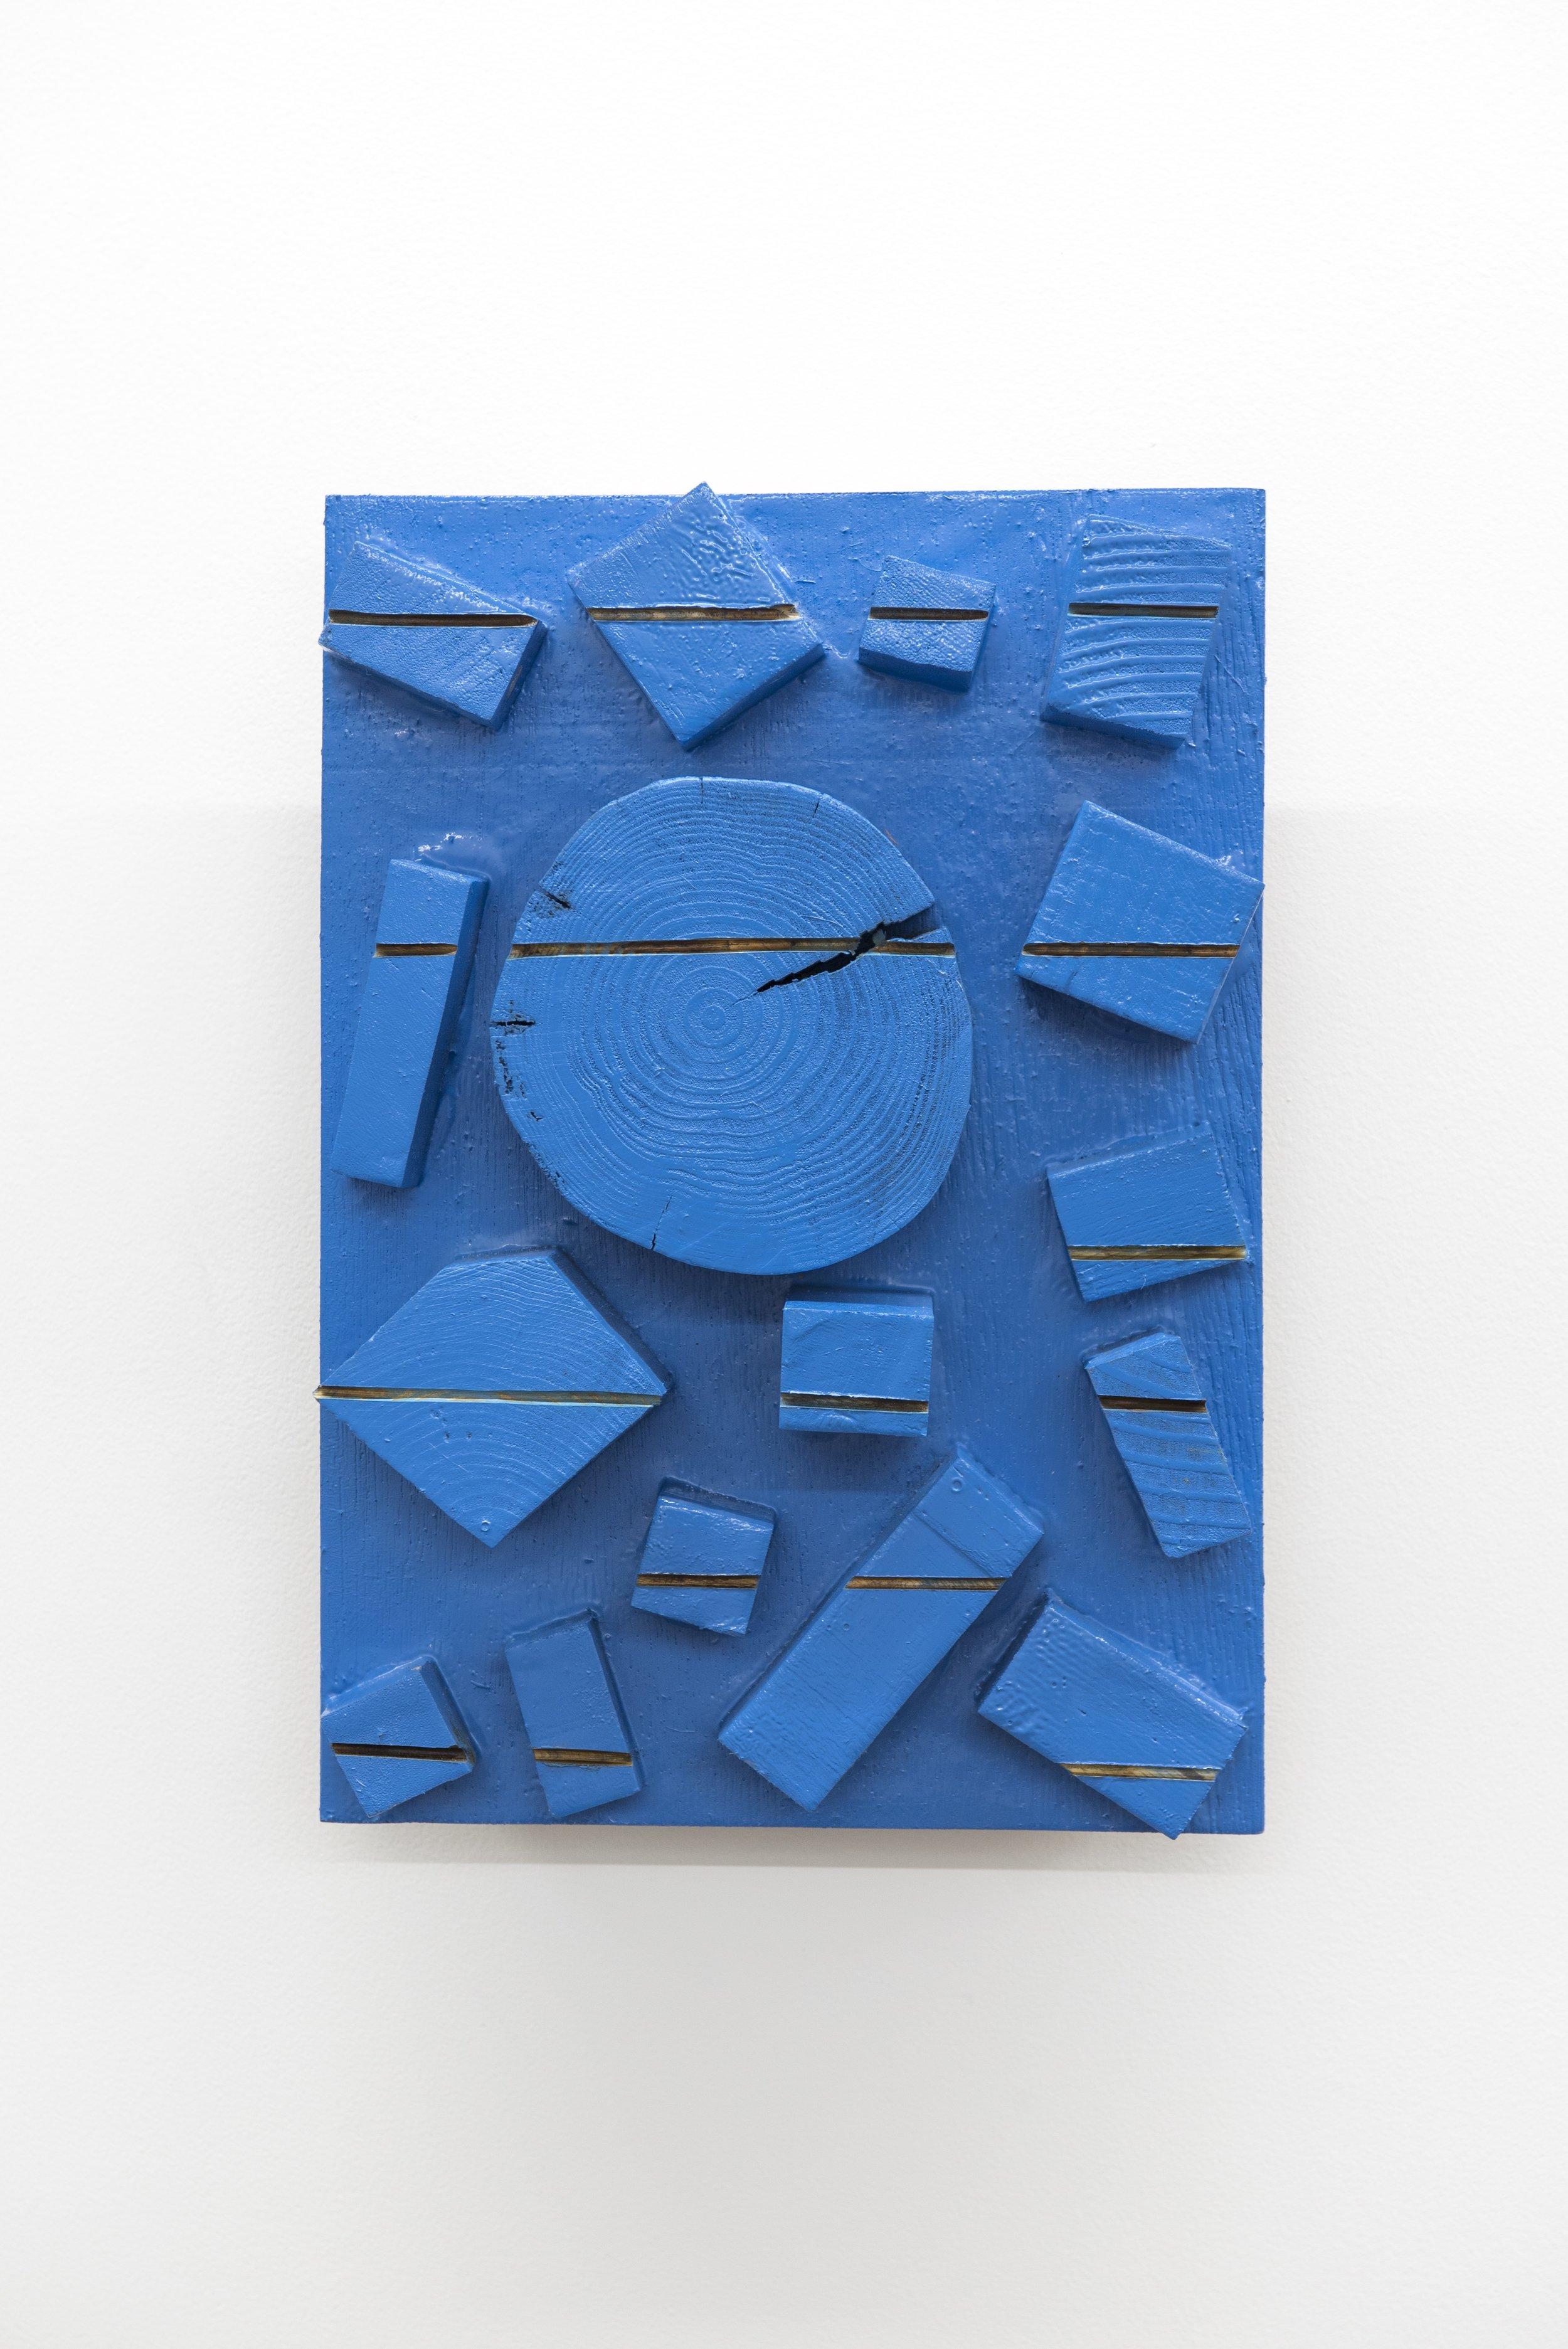 Mokuhen no Sekisen - Dokuritsu-ku    Wood, acrylic 30x21.5x9.5 cm 2000